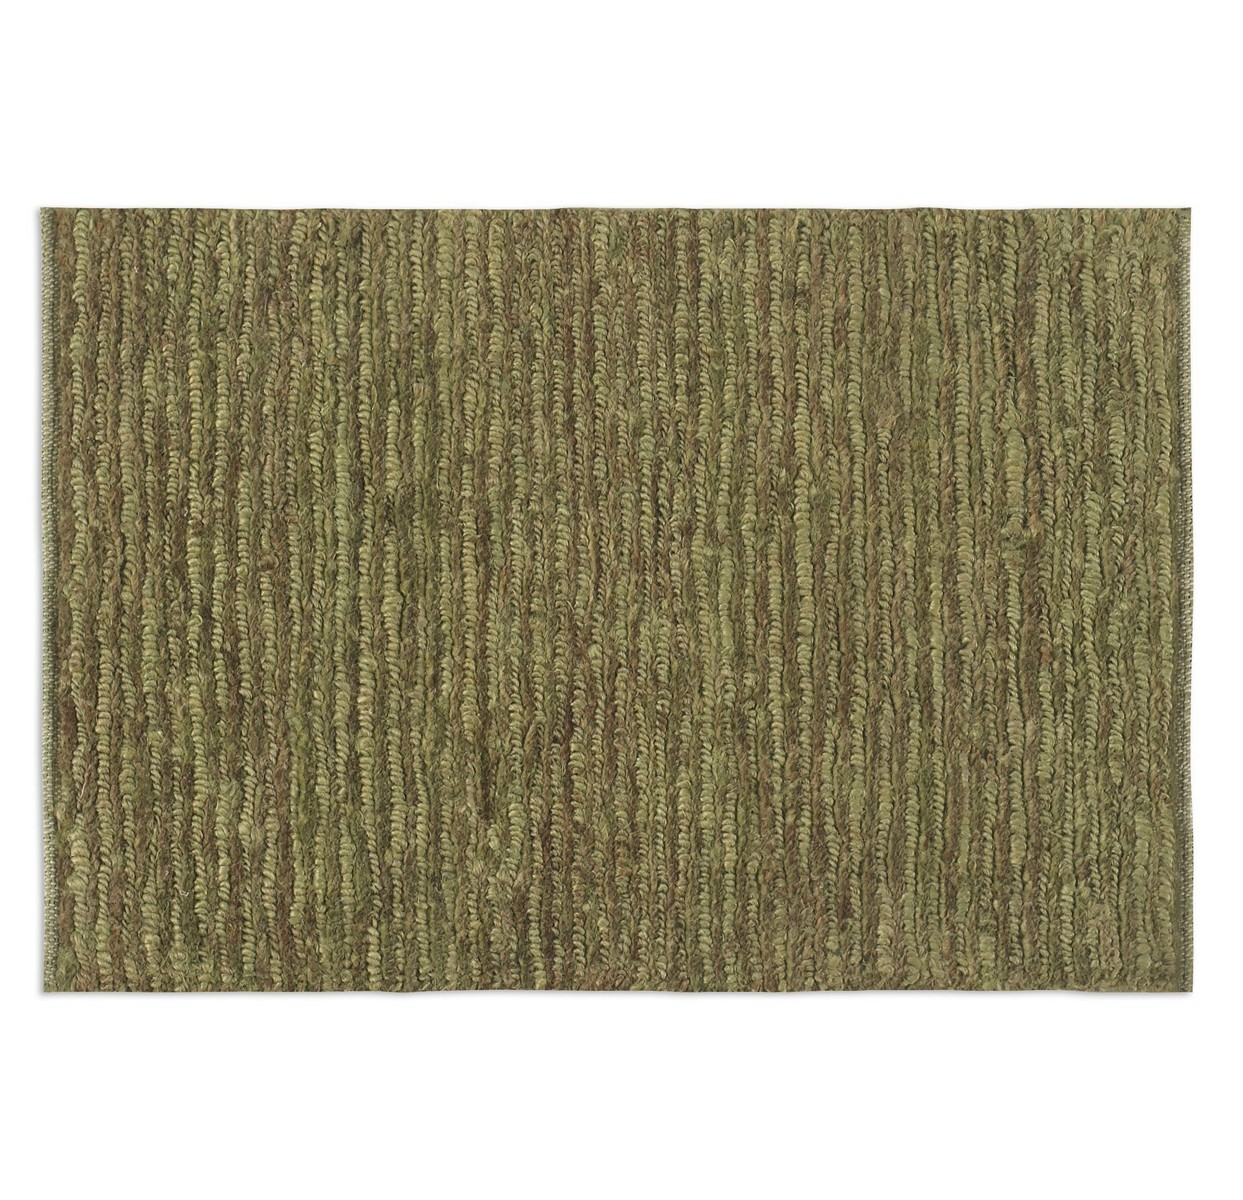 Uttermost Jessore 9 X 12 Rug - Green